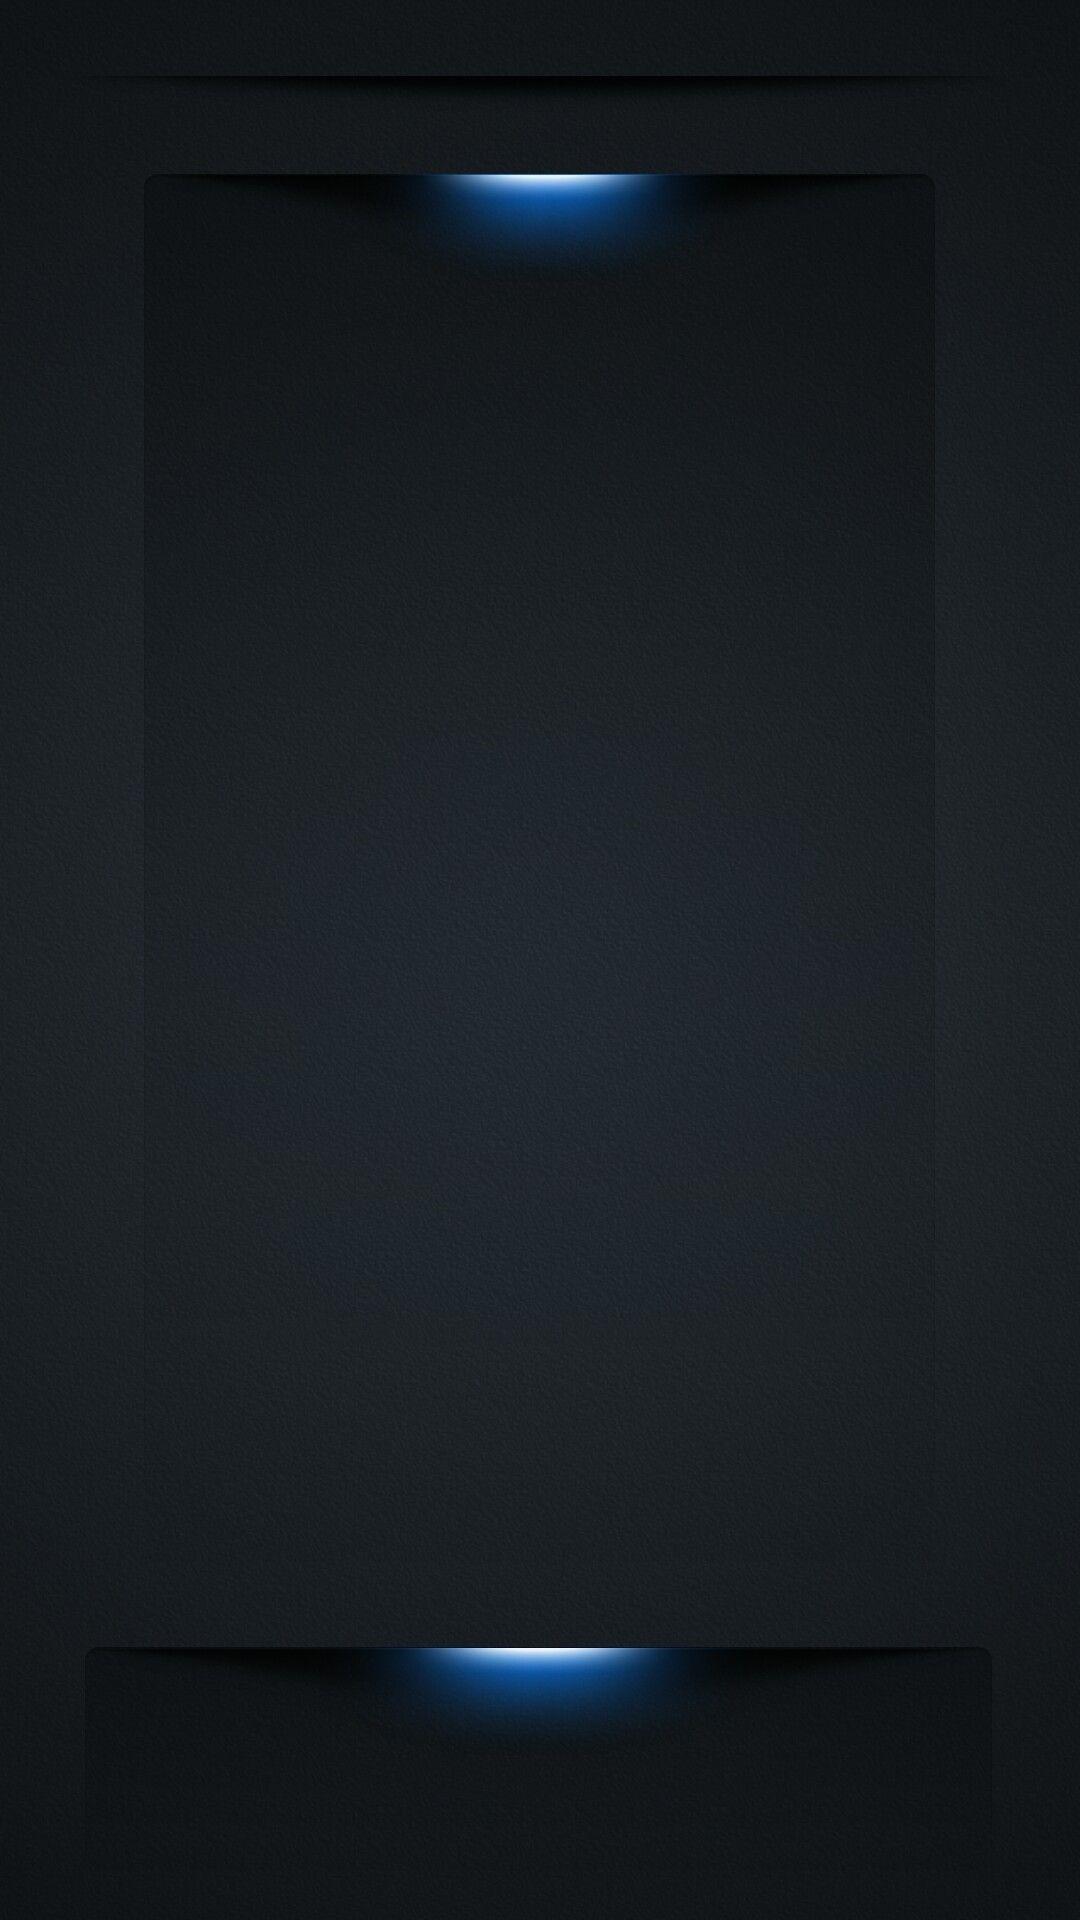 Simple iPhone hd wallpaper